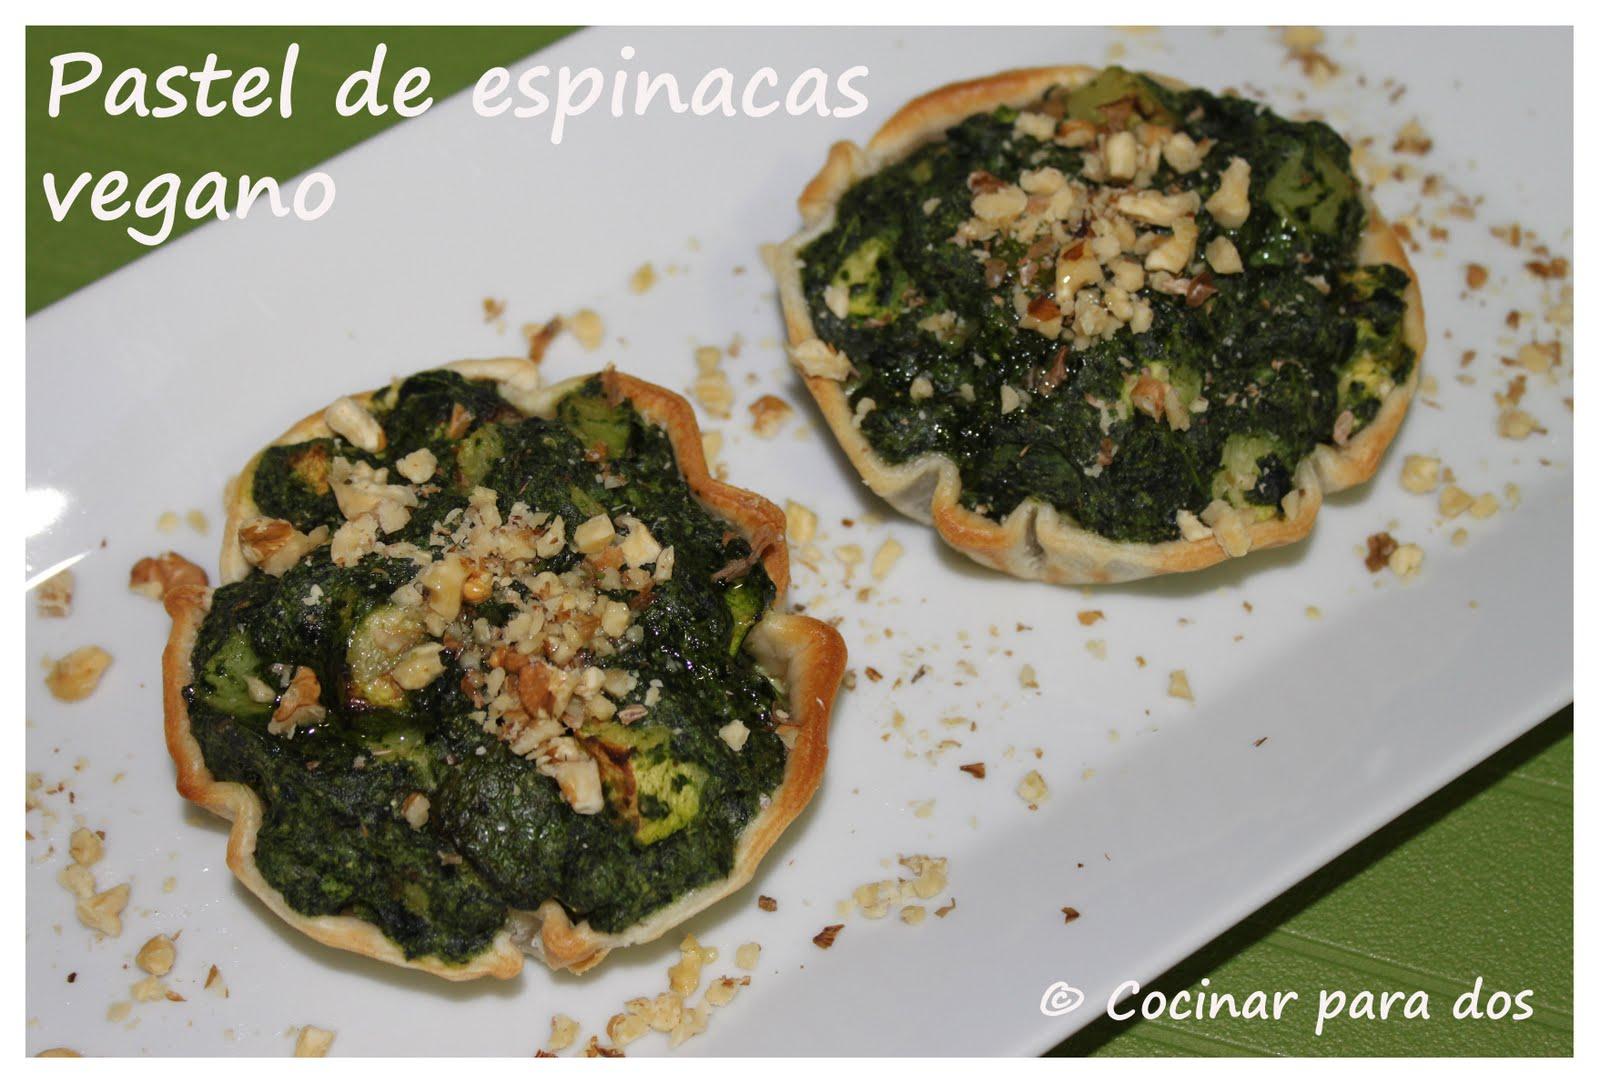 Pastel de espinacas vegano cocinar para 2 for Cocinar espinacas